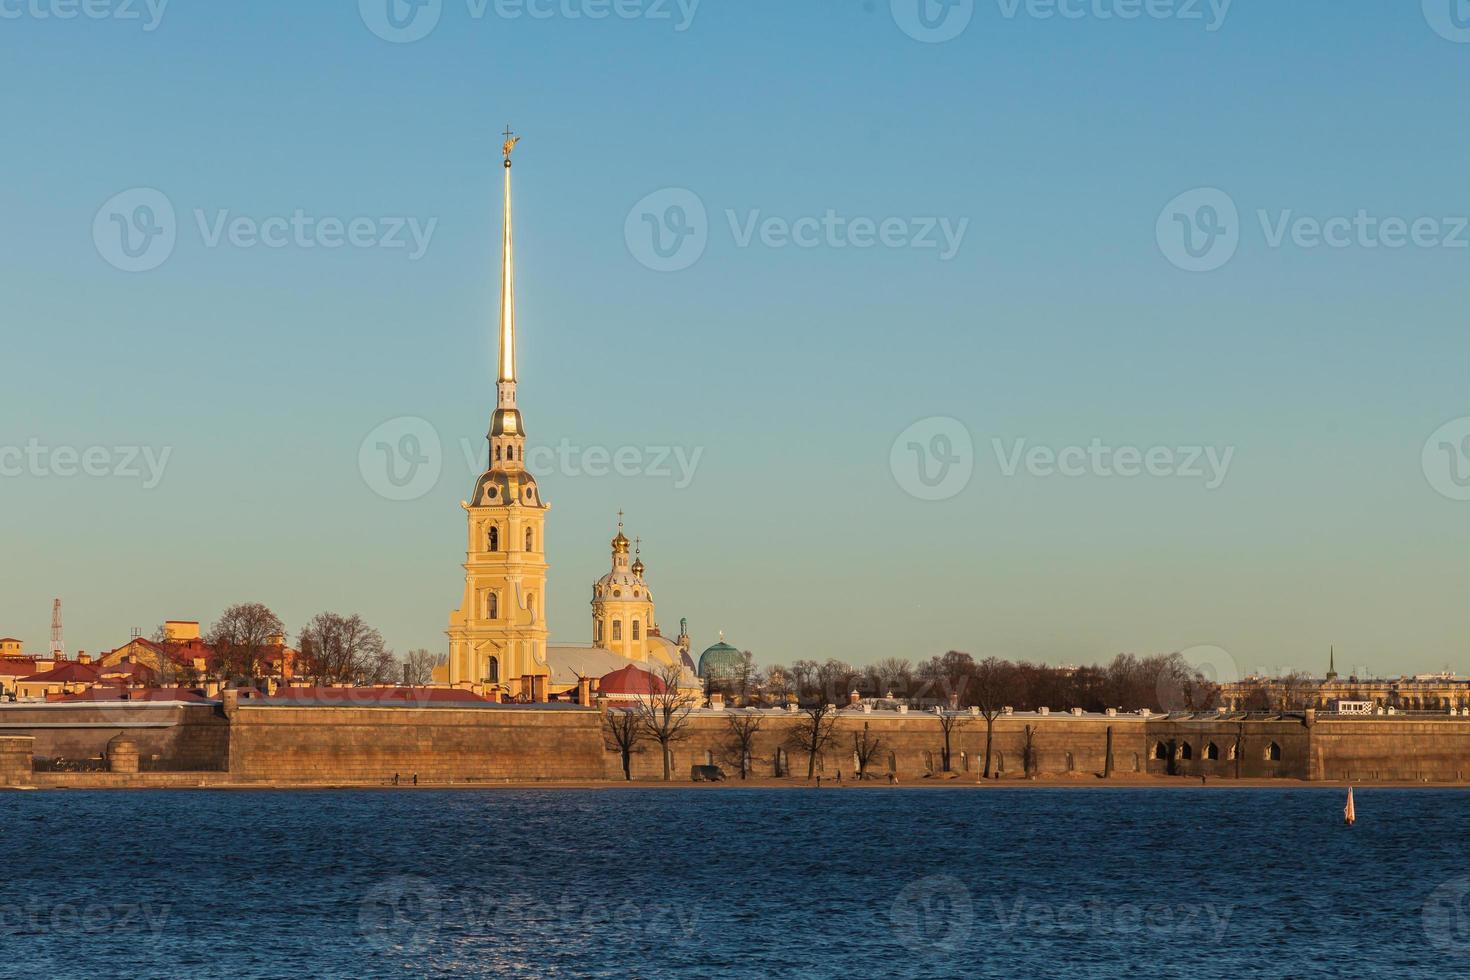 peter y paul fortaleza en st. Petersburgo, Rusia foto